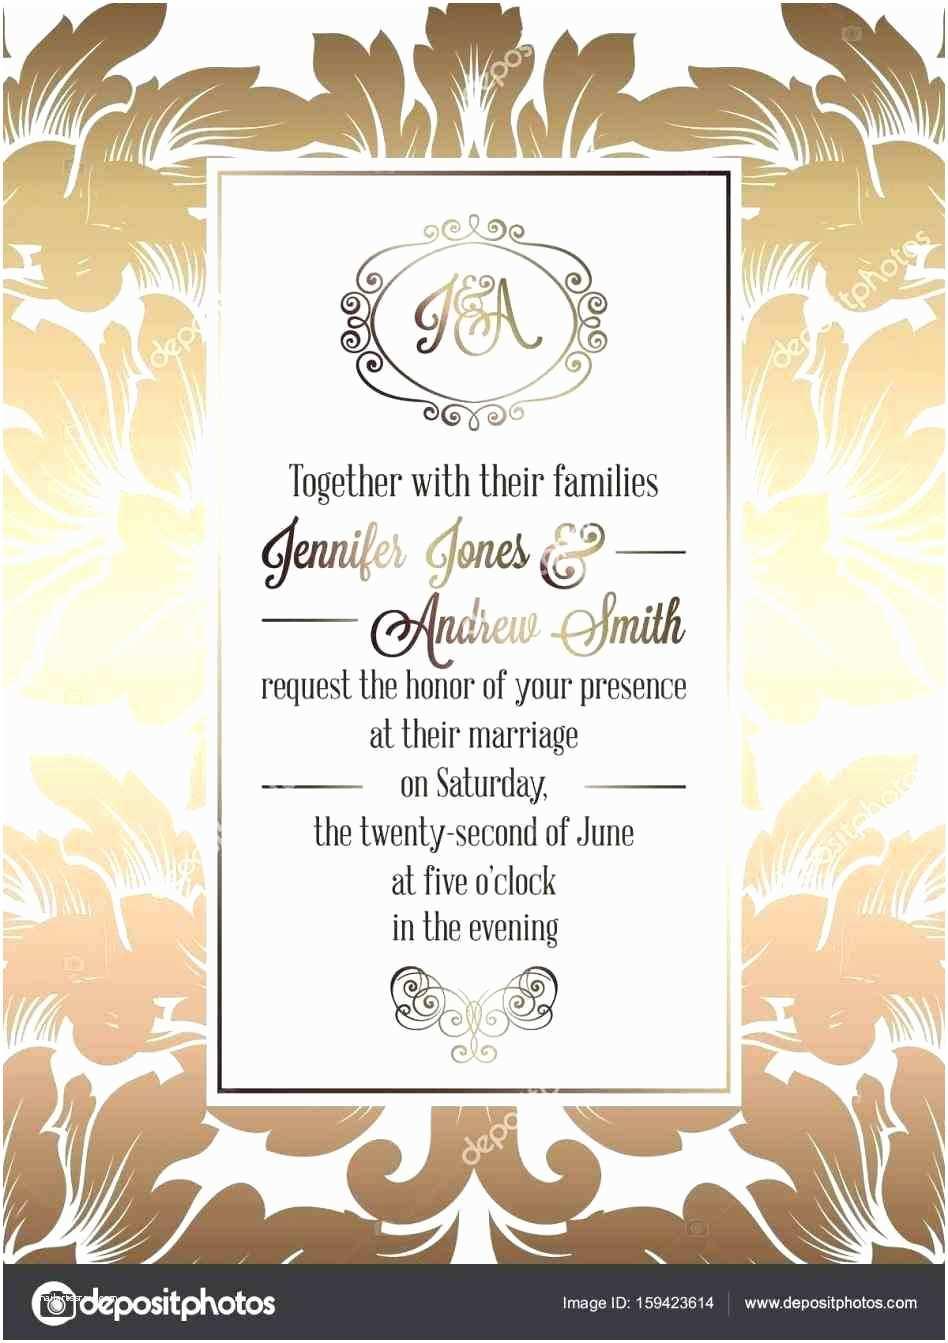 Editable Wedding Invitation Cards Free Download Create Line Editable Wedding Invitation Cards Free